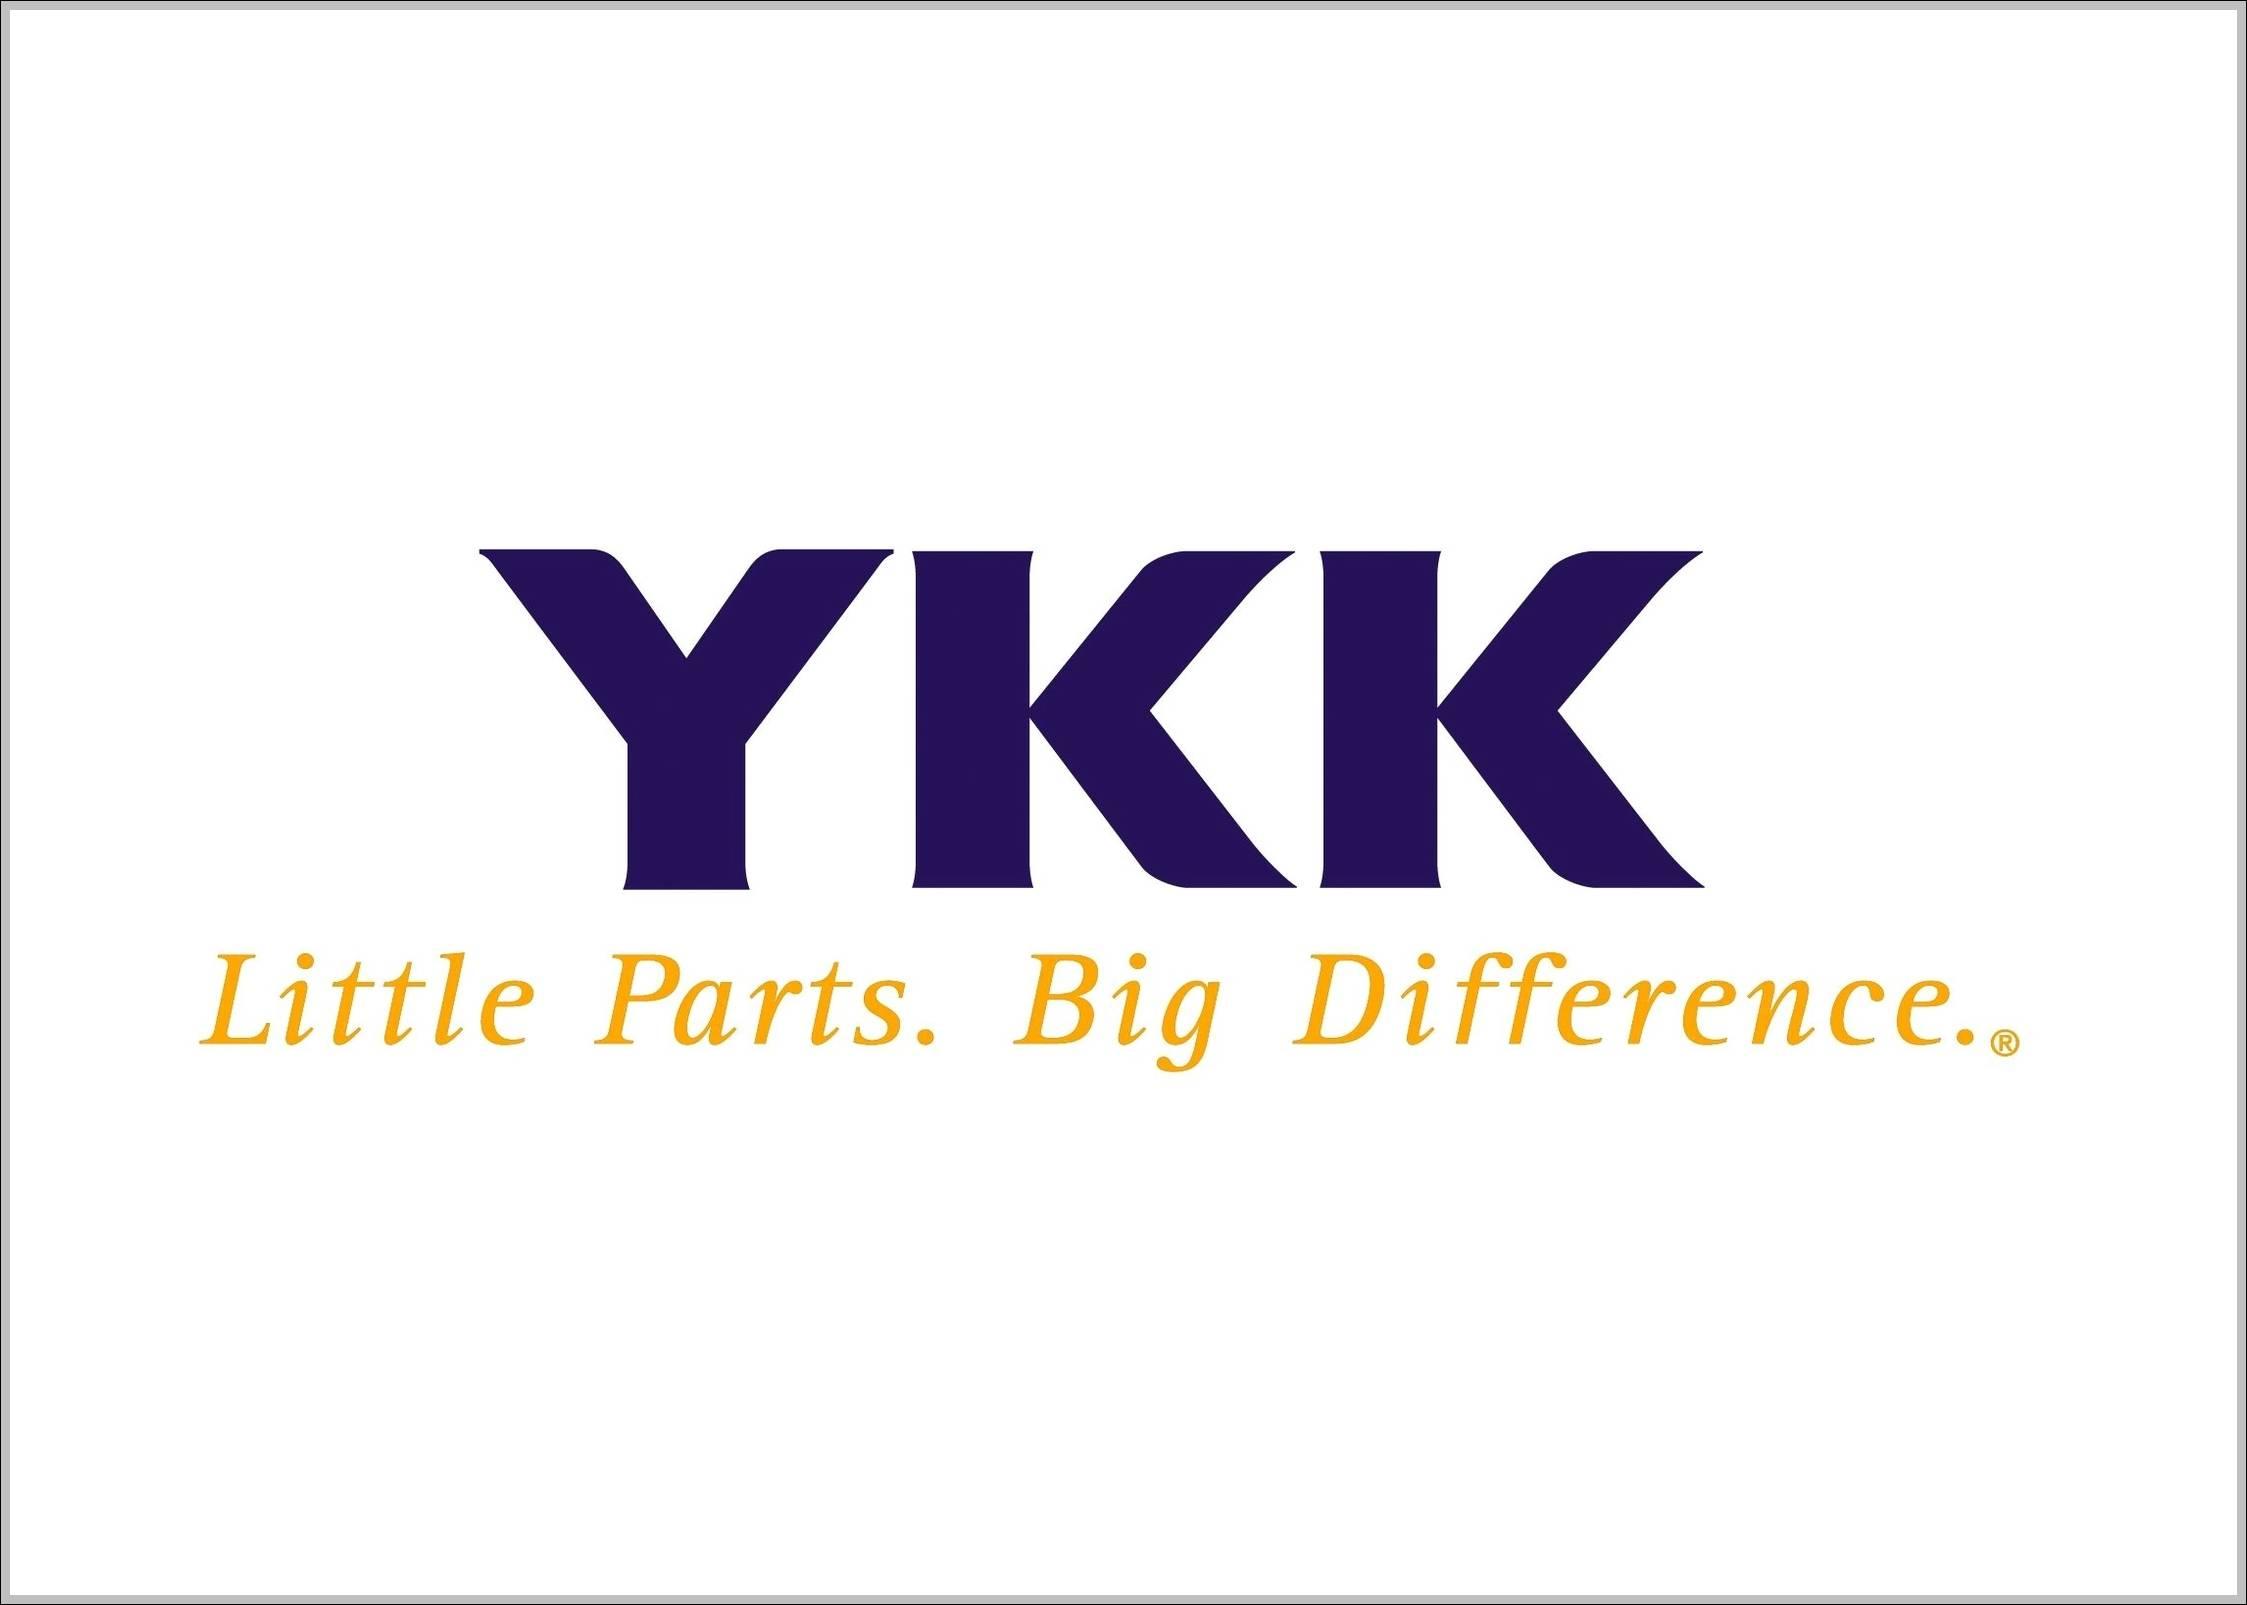 YKK logo slogan